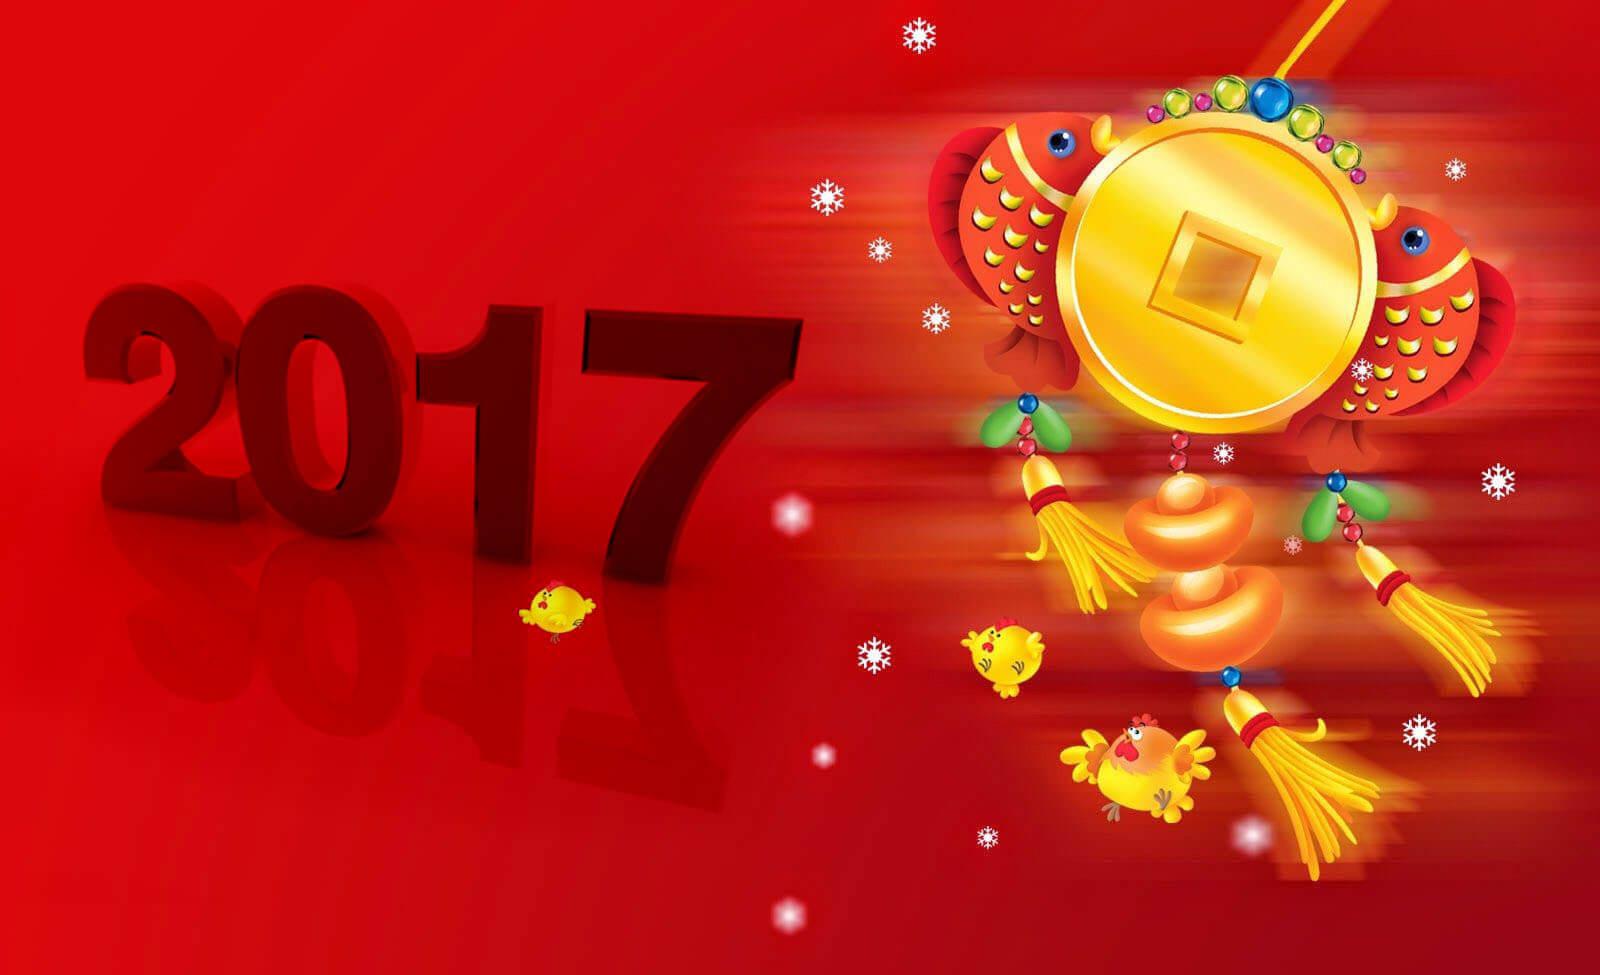 Happy New Year 2017 HD Gallery